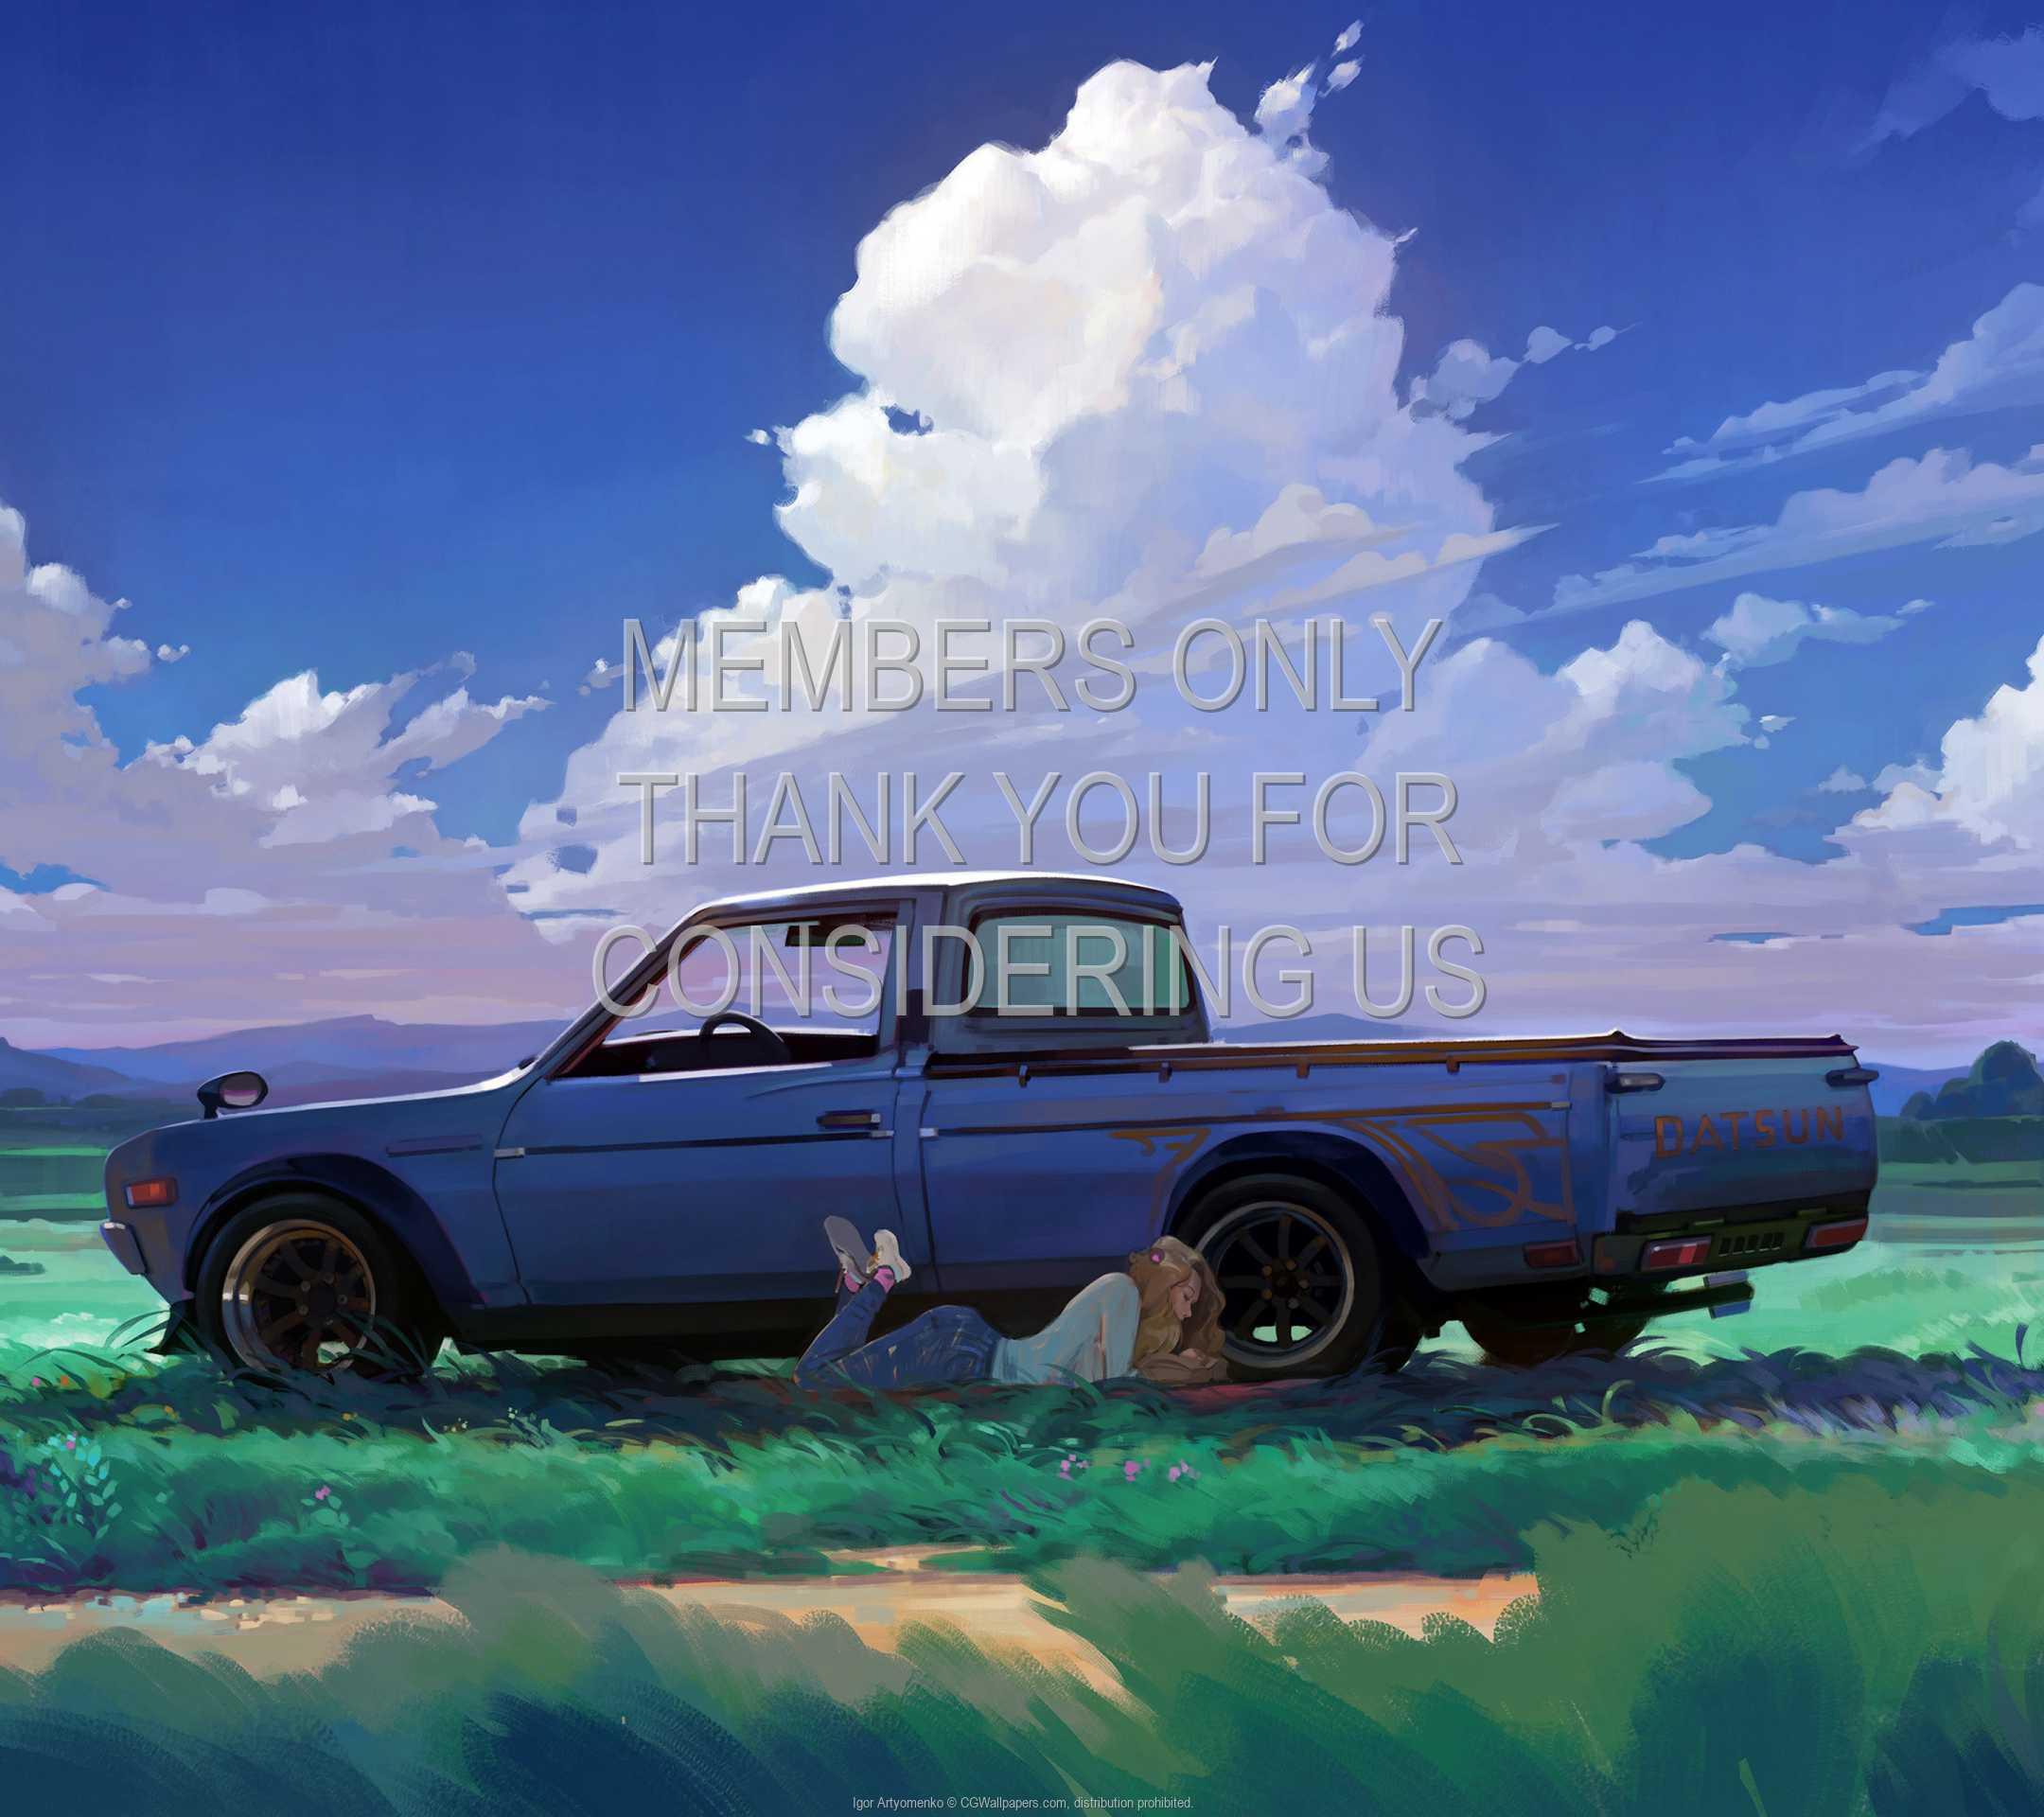 Igor Artyomenko 1080p Horizontal Mobile wallpaper or background 19